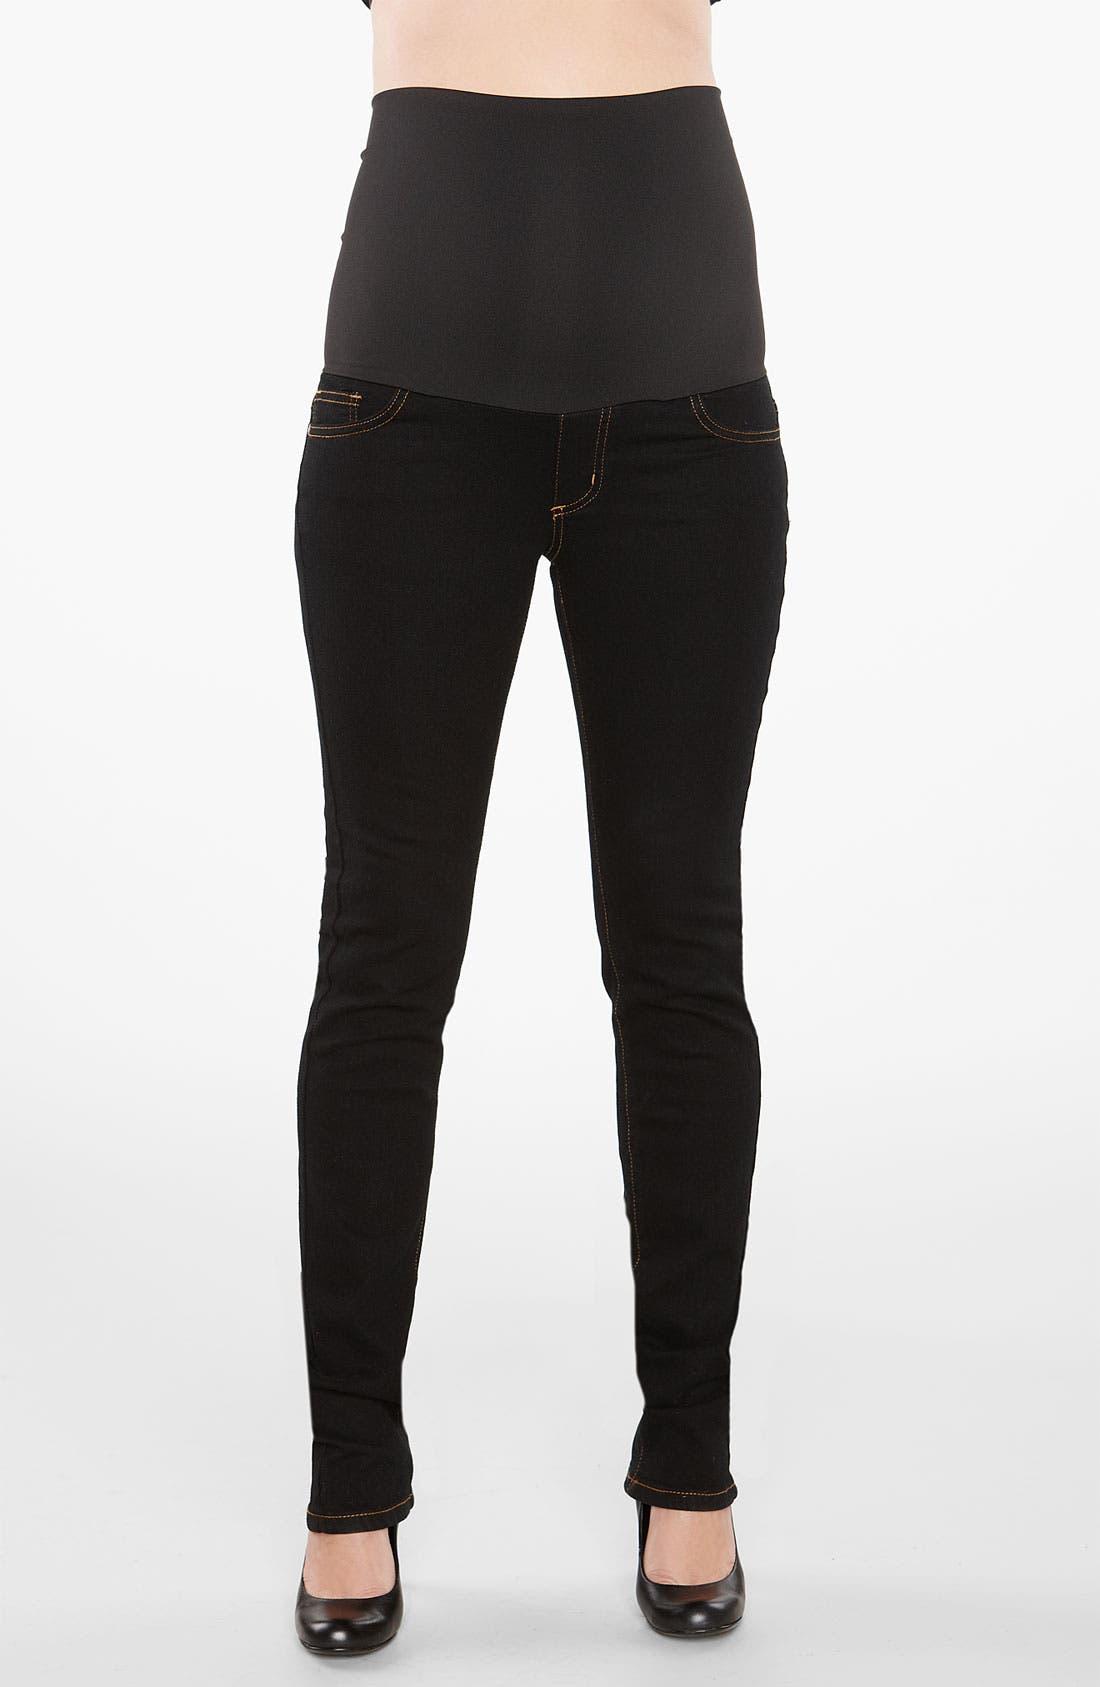 Straight Leg Stretch Maternity Jeans,                             Alternate thumbnail 2, color,                             Black